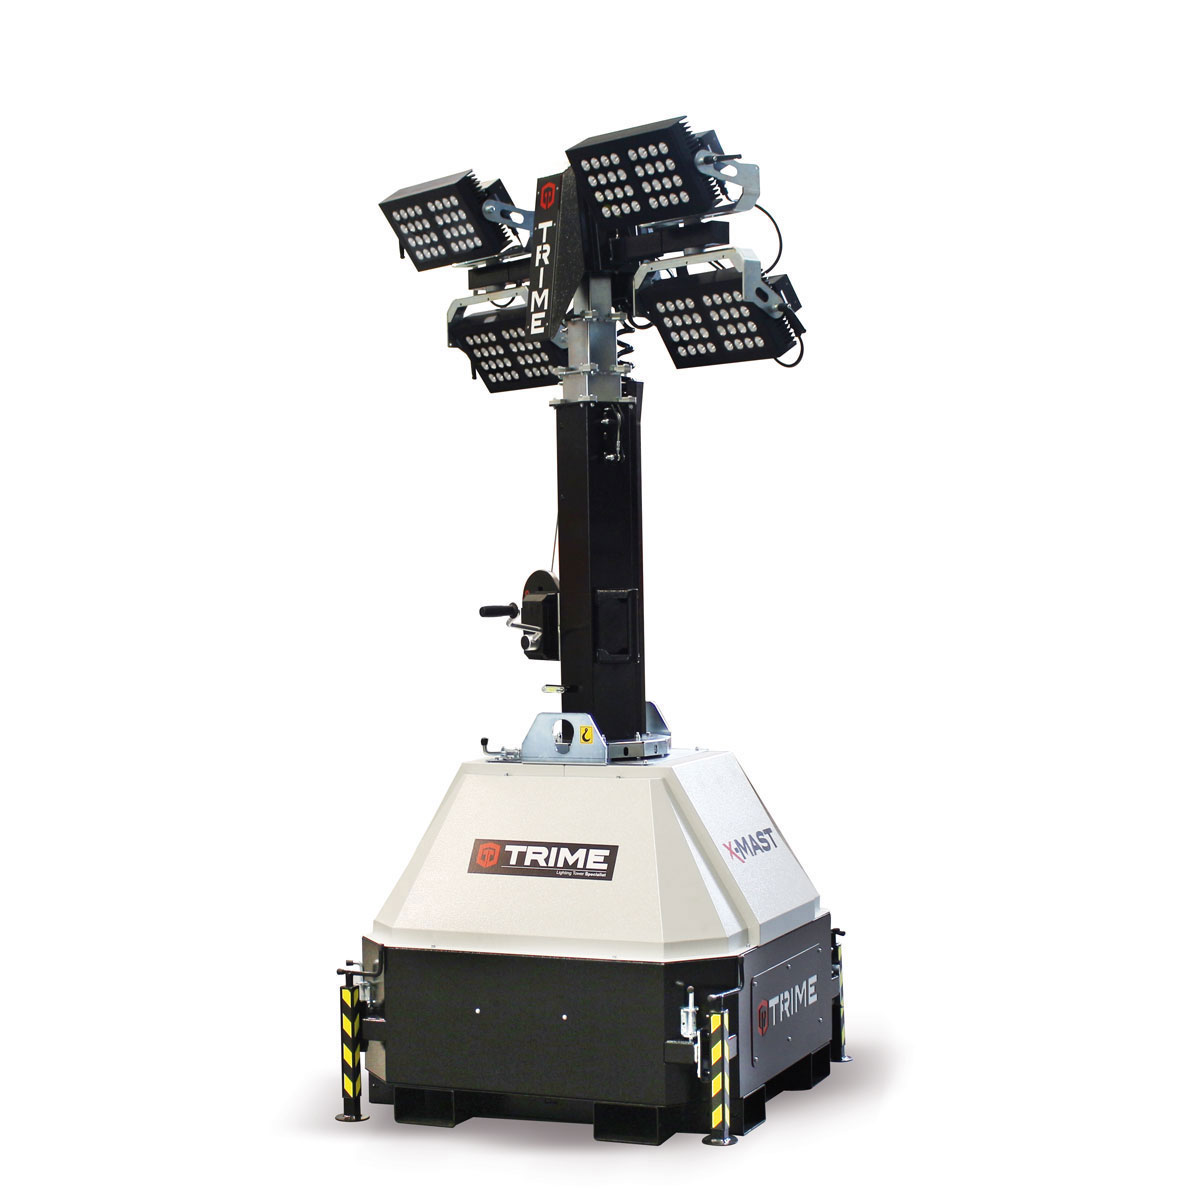 prozektoru-masts-led-x-mast-4x300W-salikta-pozicija